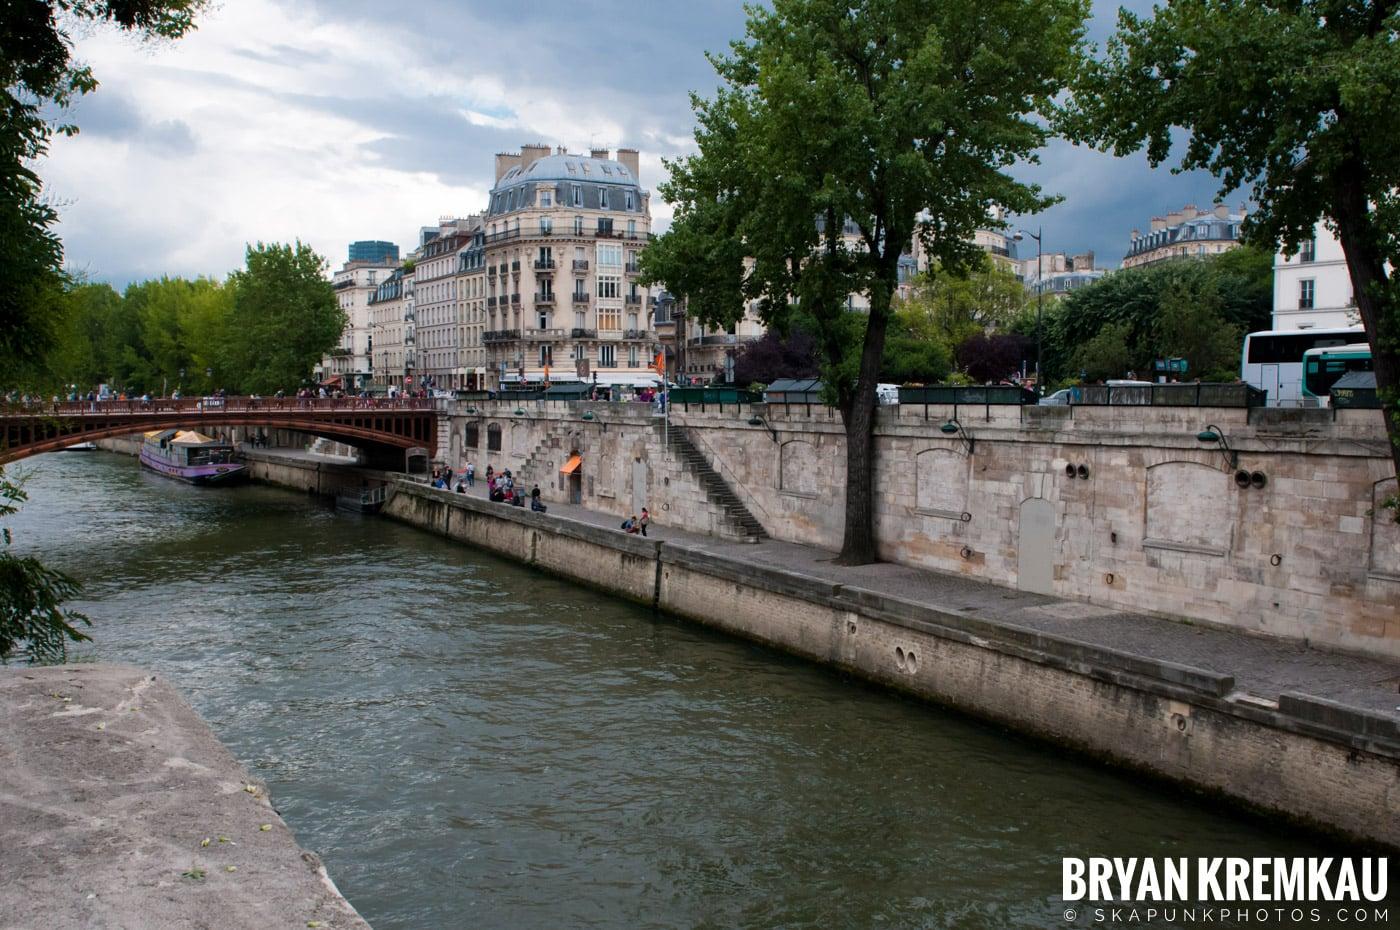 Paris, France Honeymoon - Day 4 - 7.21.11 (1)